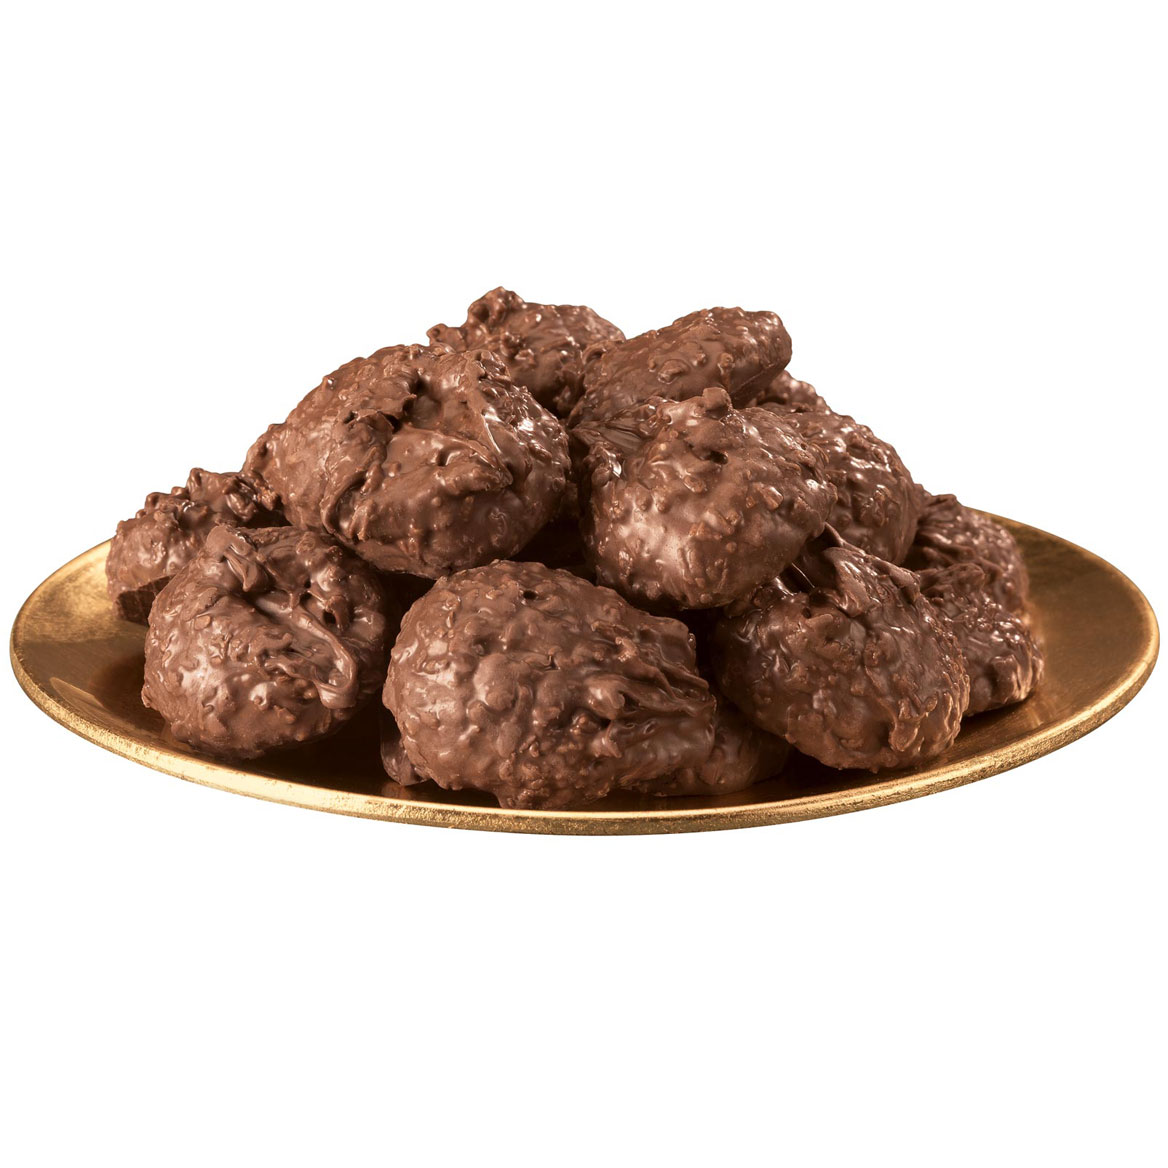 Sugar Free Coconut Clusters 12 oz.-347204